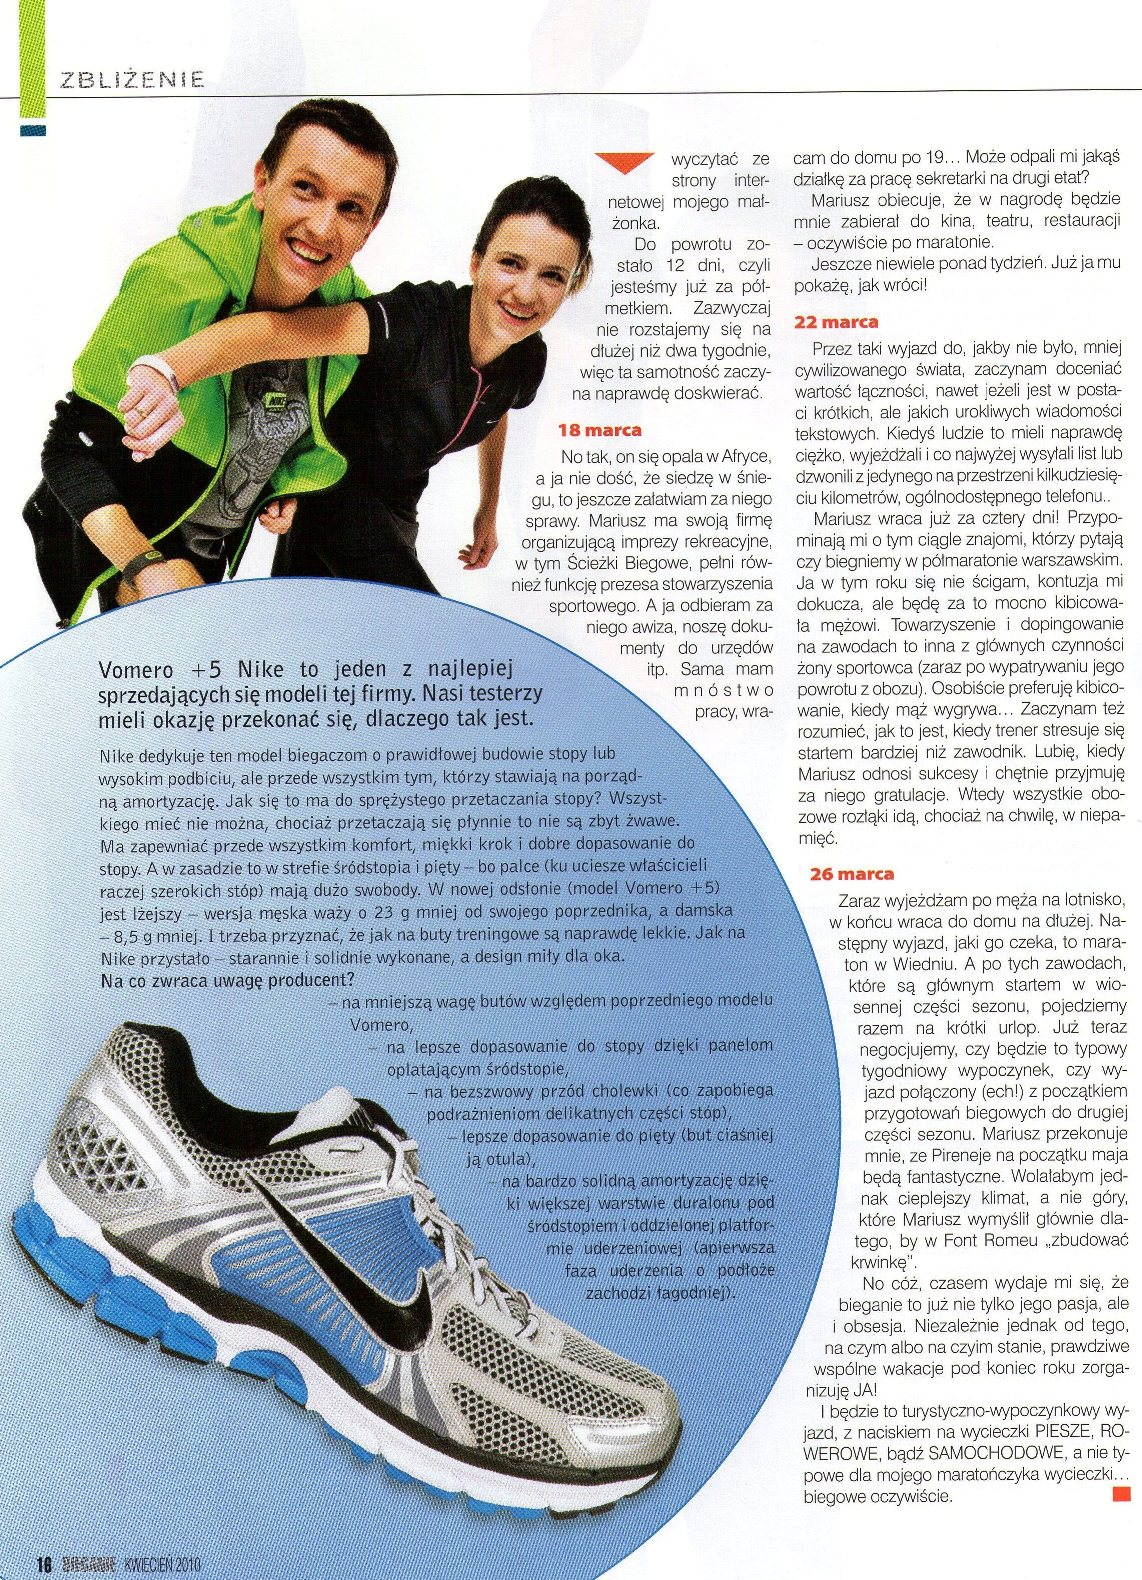 bieganie-kwiecien-2010-4